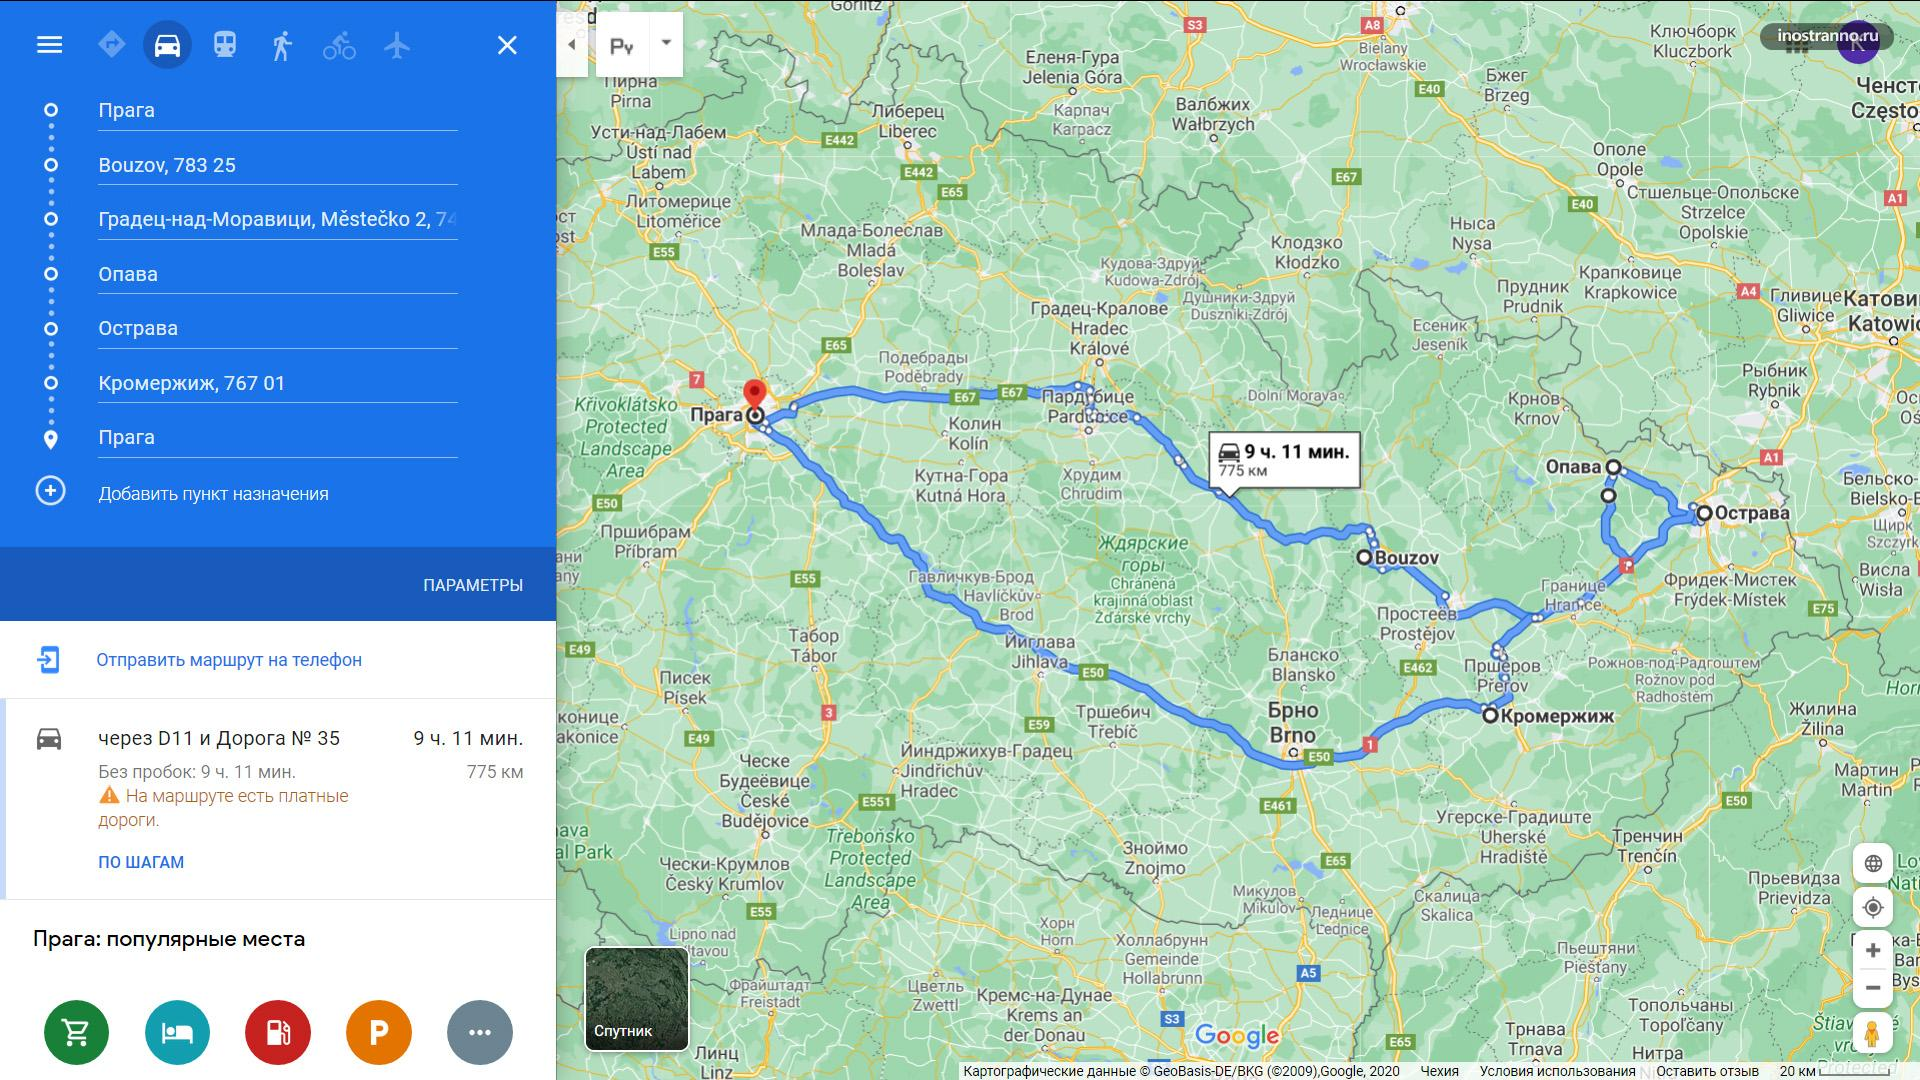 Карта маршрута из Праги в Остраву